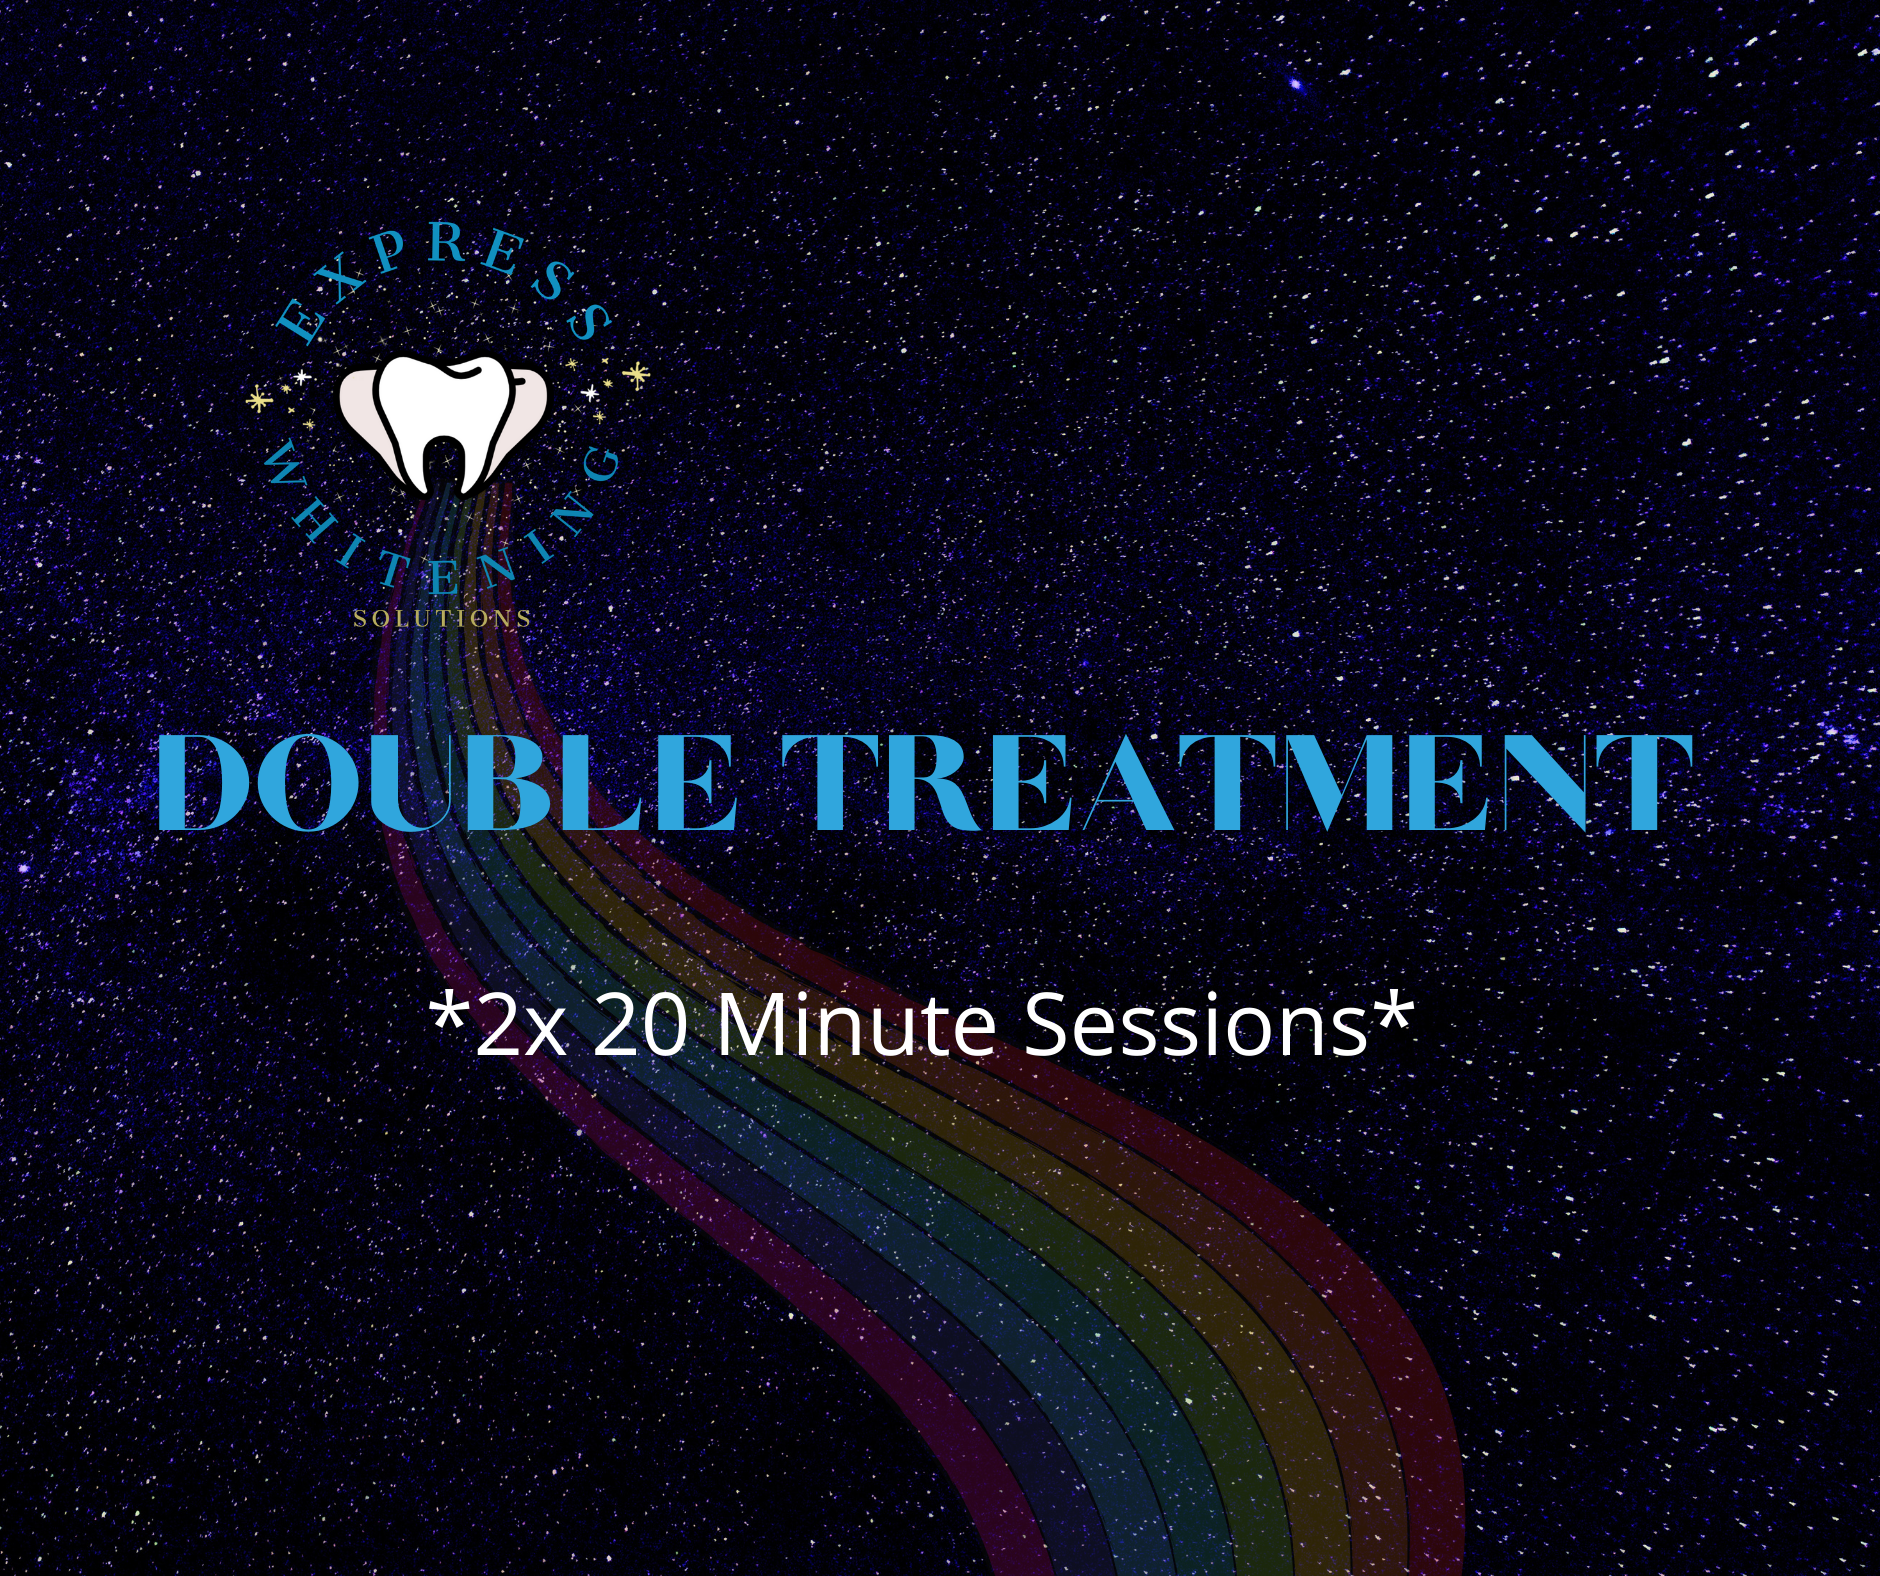 Double Treatment